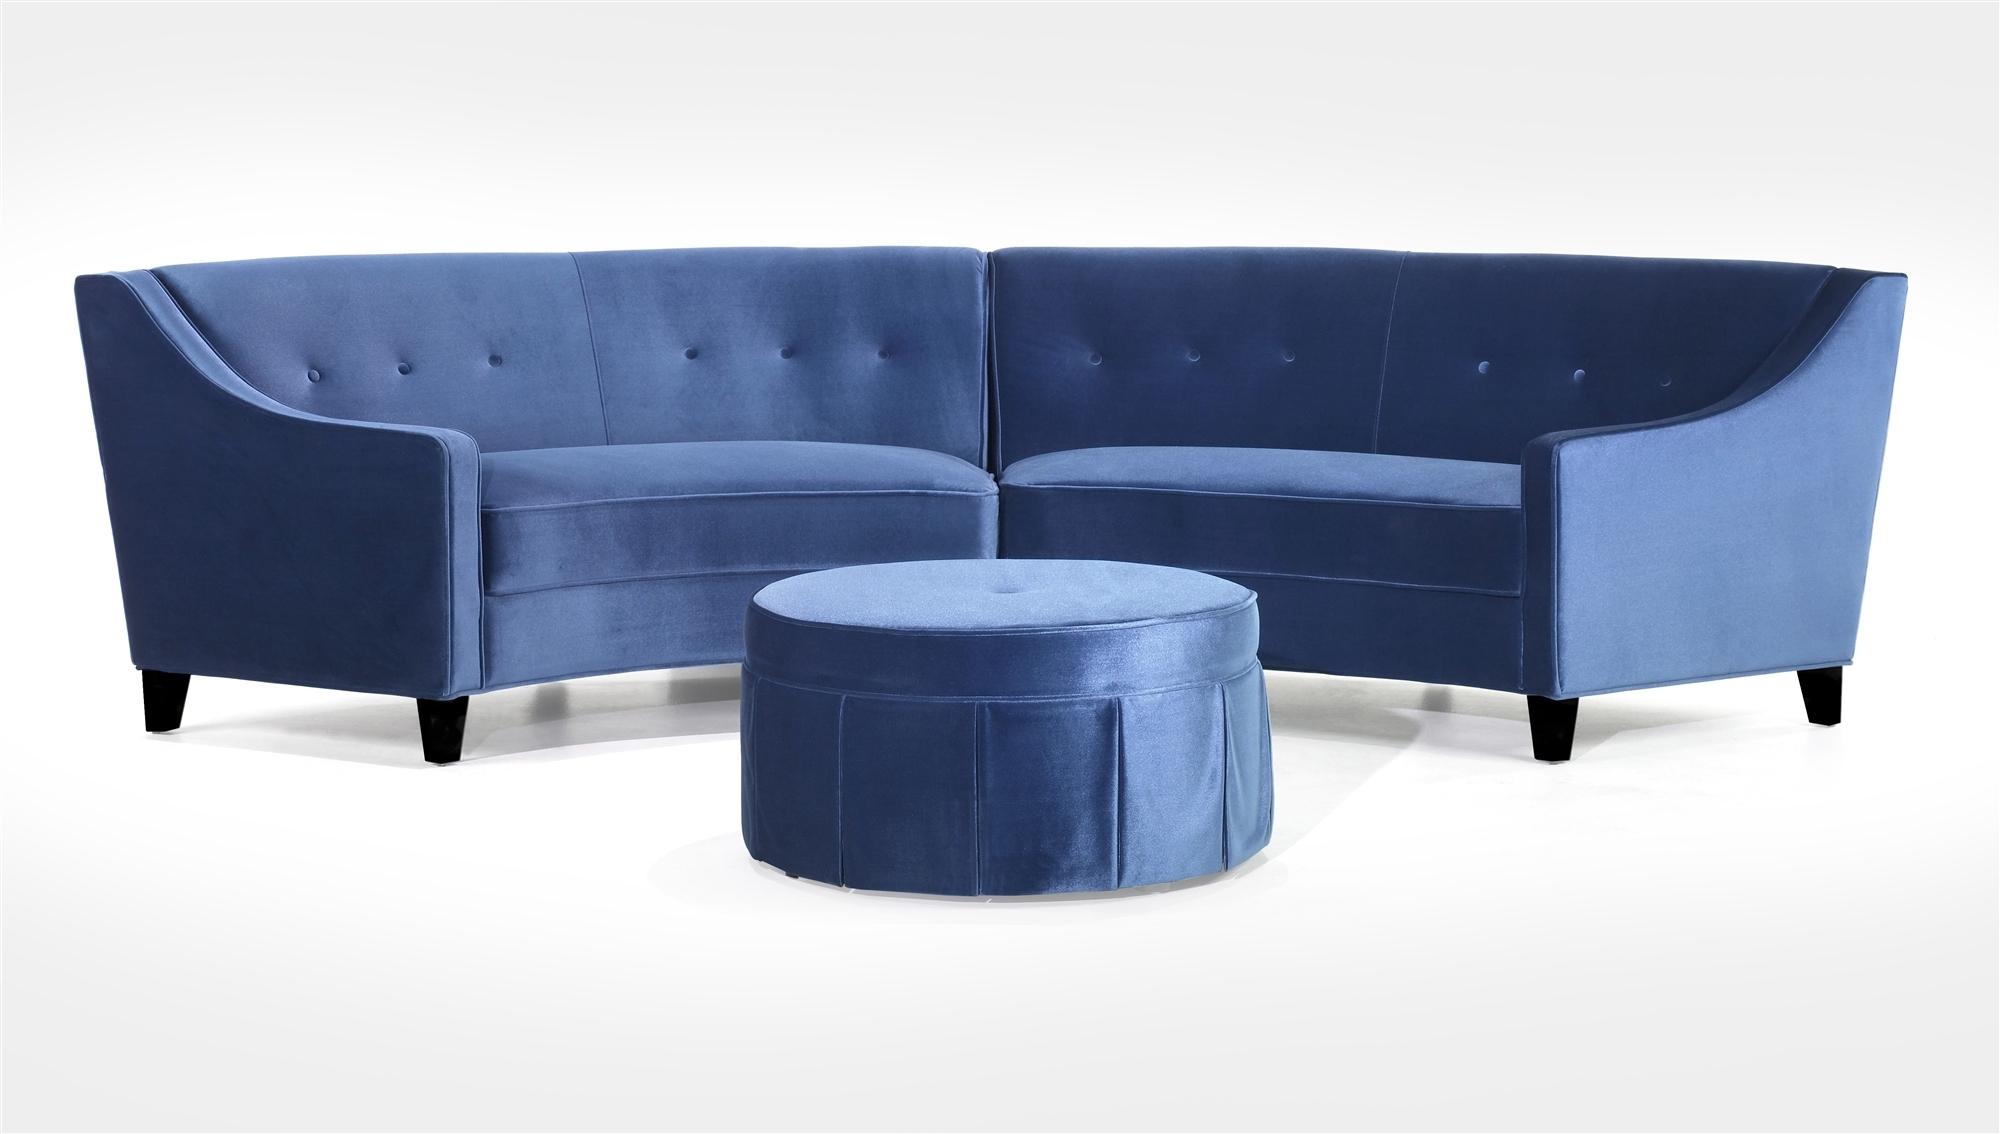 10 Best Sleek Sectional Sofas Sofa Ideas